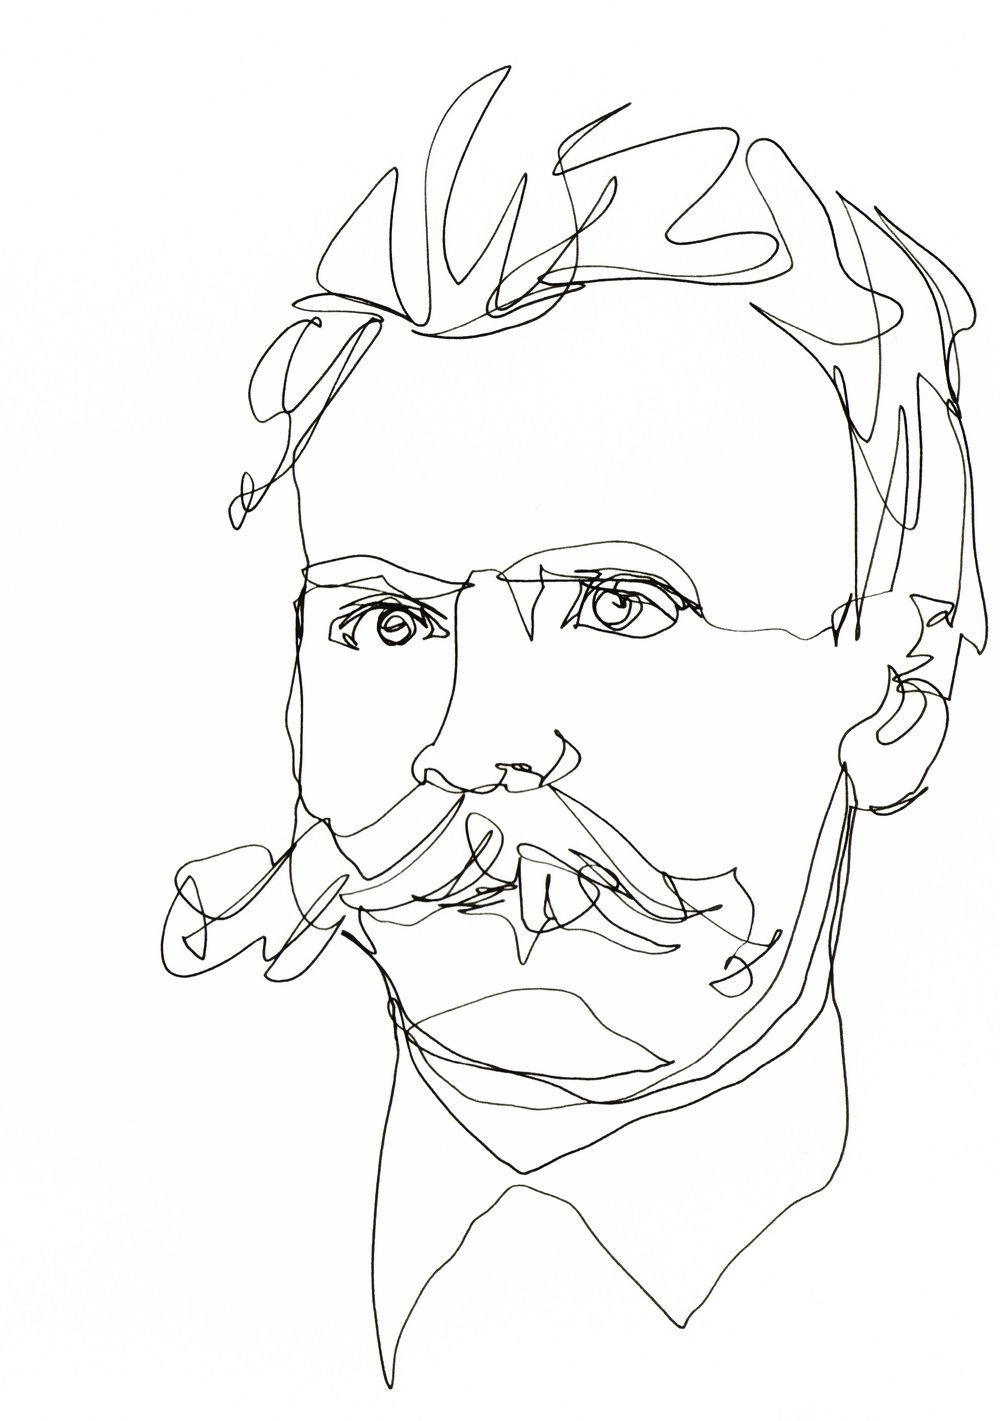 4_Image_Single Continuous Line_Nietzsche_©TamarLevi 127.jpg